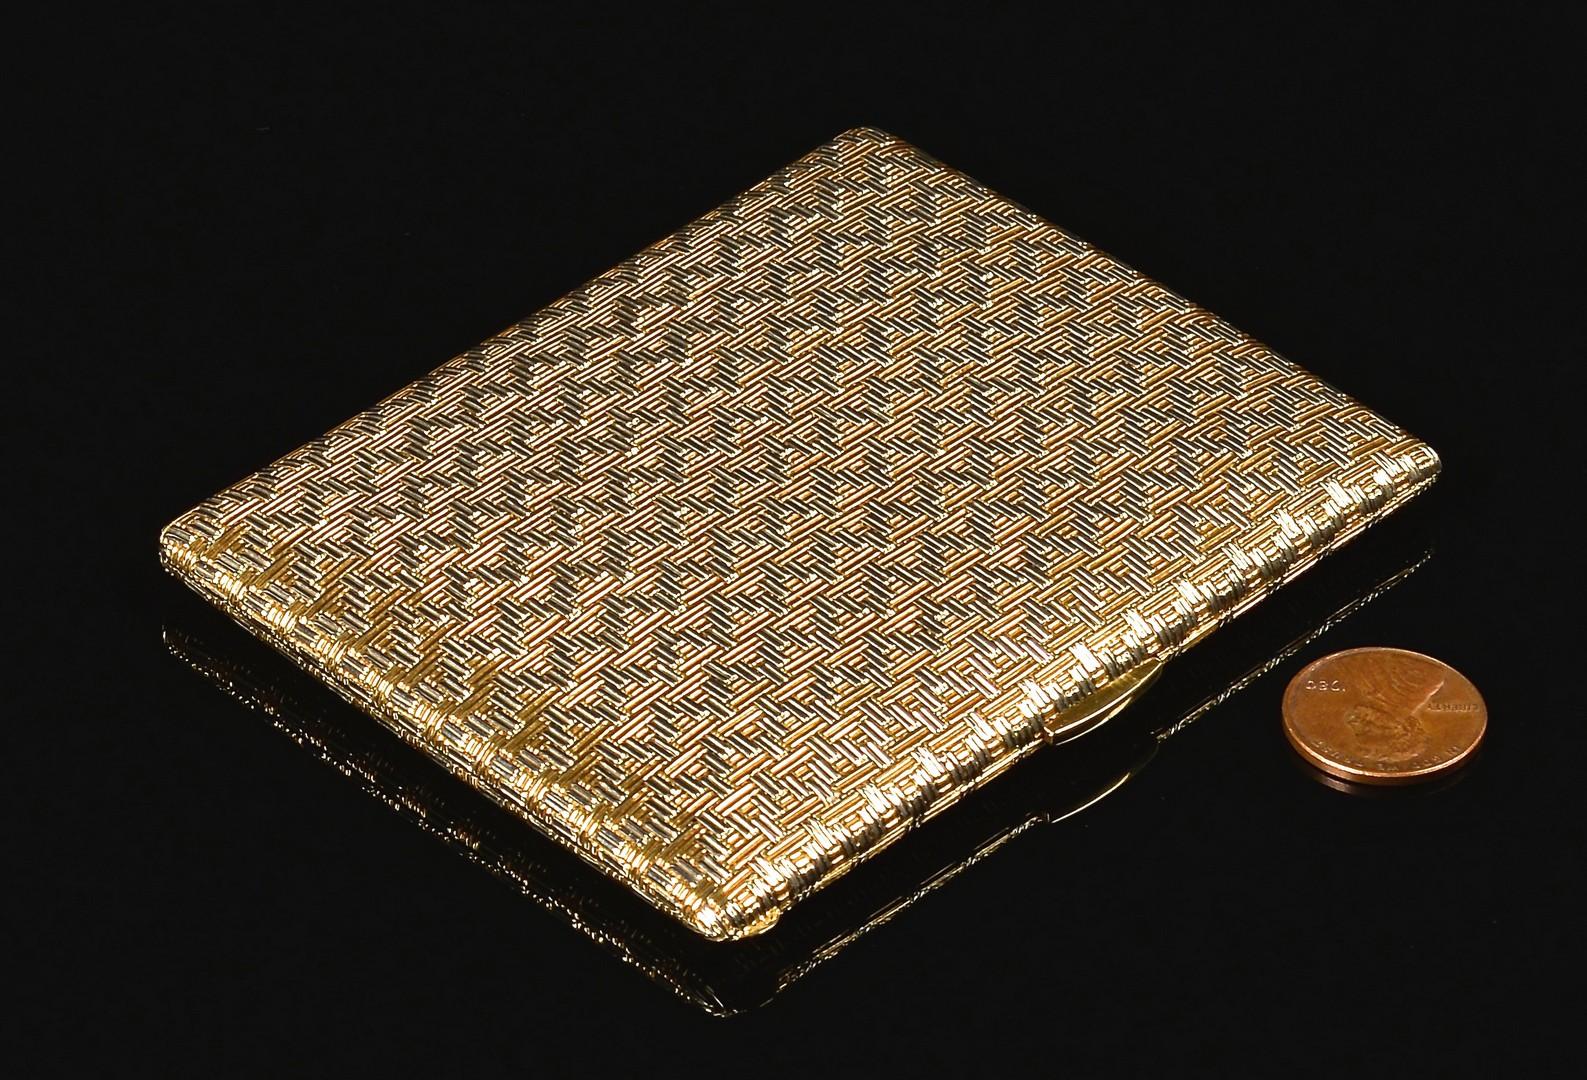 Lot 69: 18k Tiffany Cigarette Case, 135.5 grams